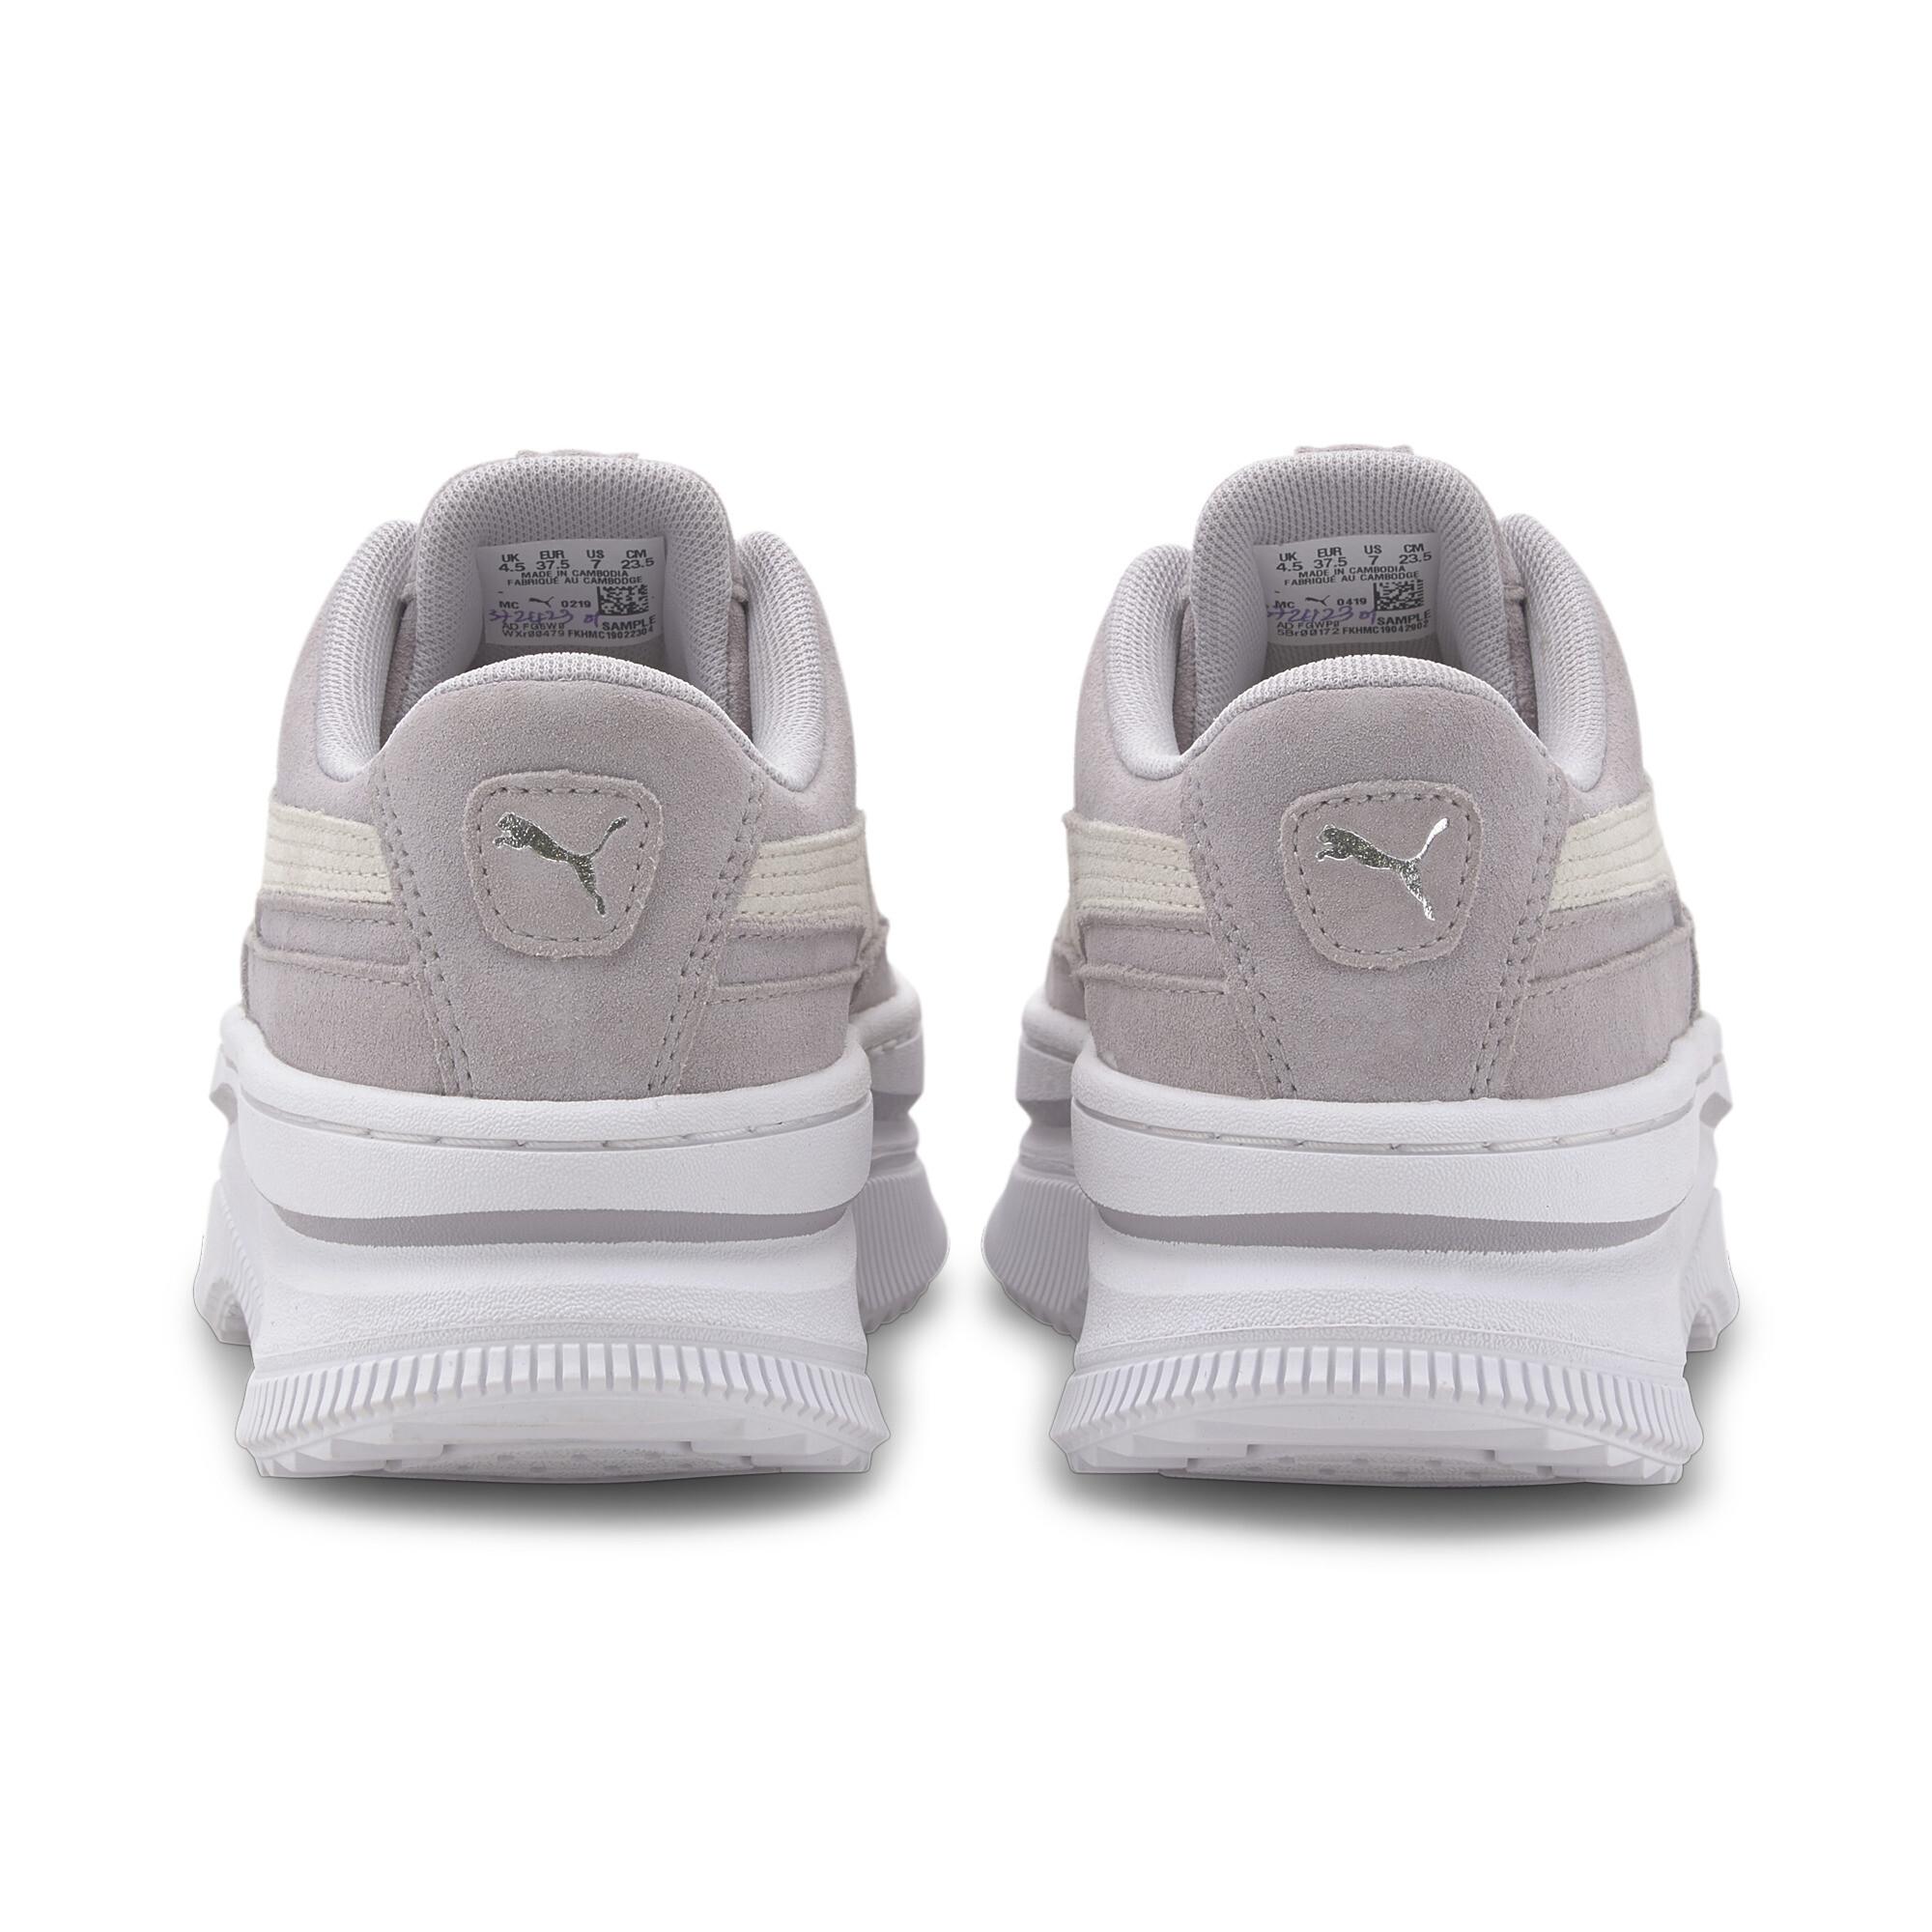 PUMA-Women-039-s-DEVA-Suede-Sneakers thumbnail 17